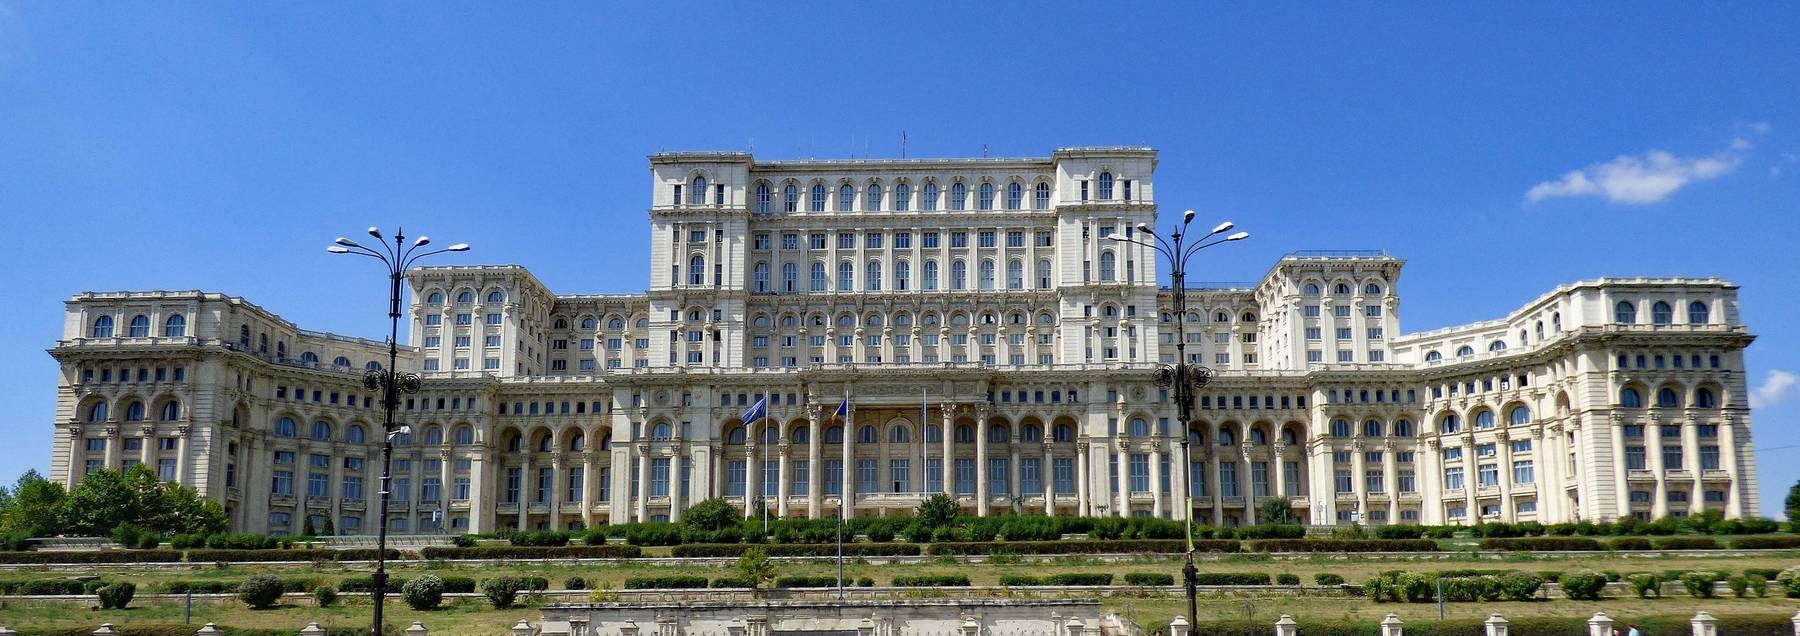 Bukarest Rumänien Parlamentsgebäude